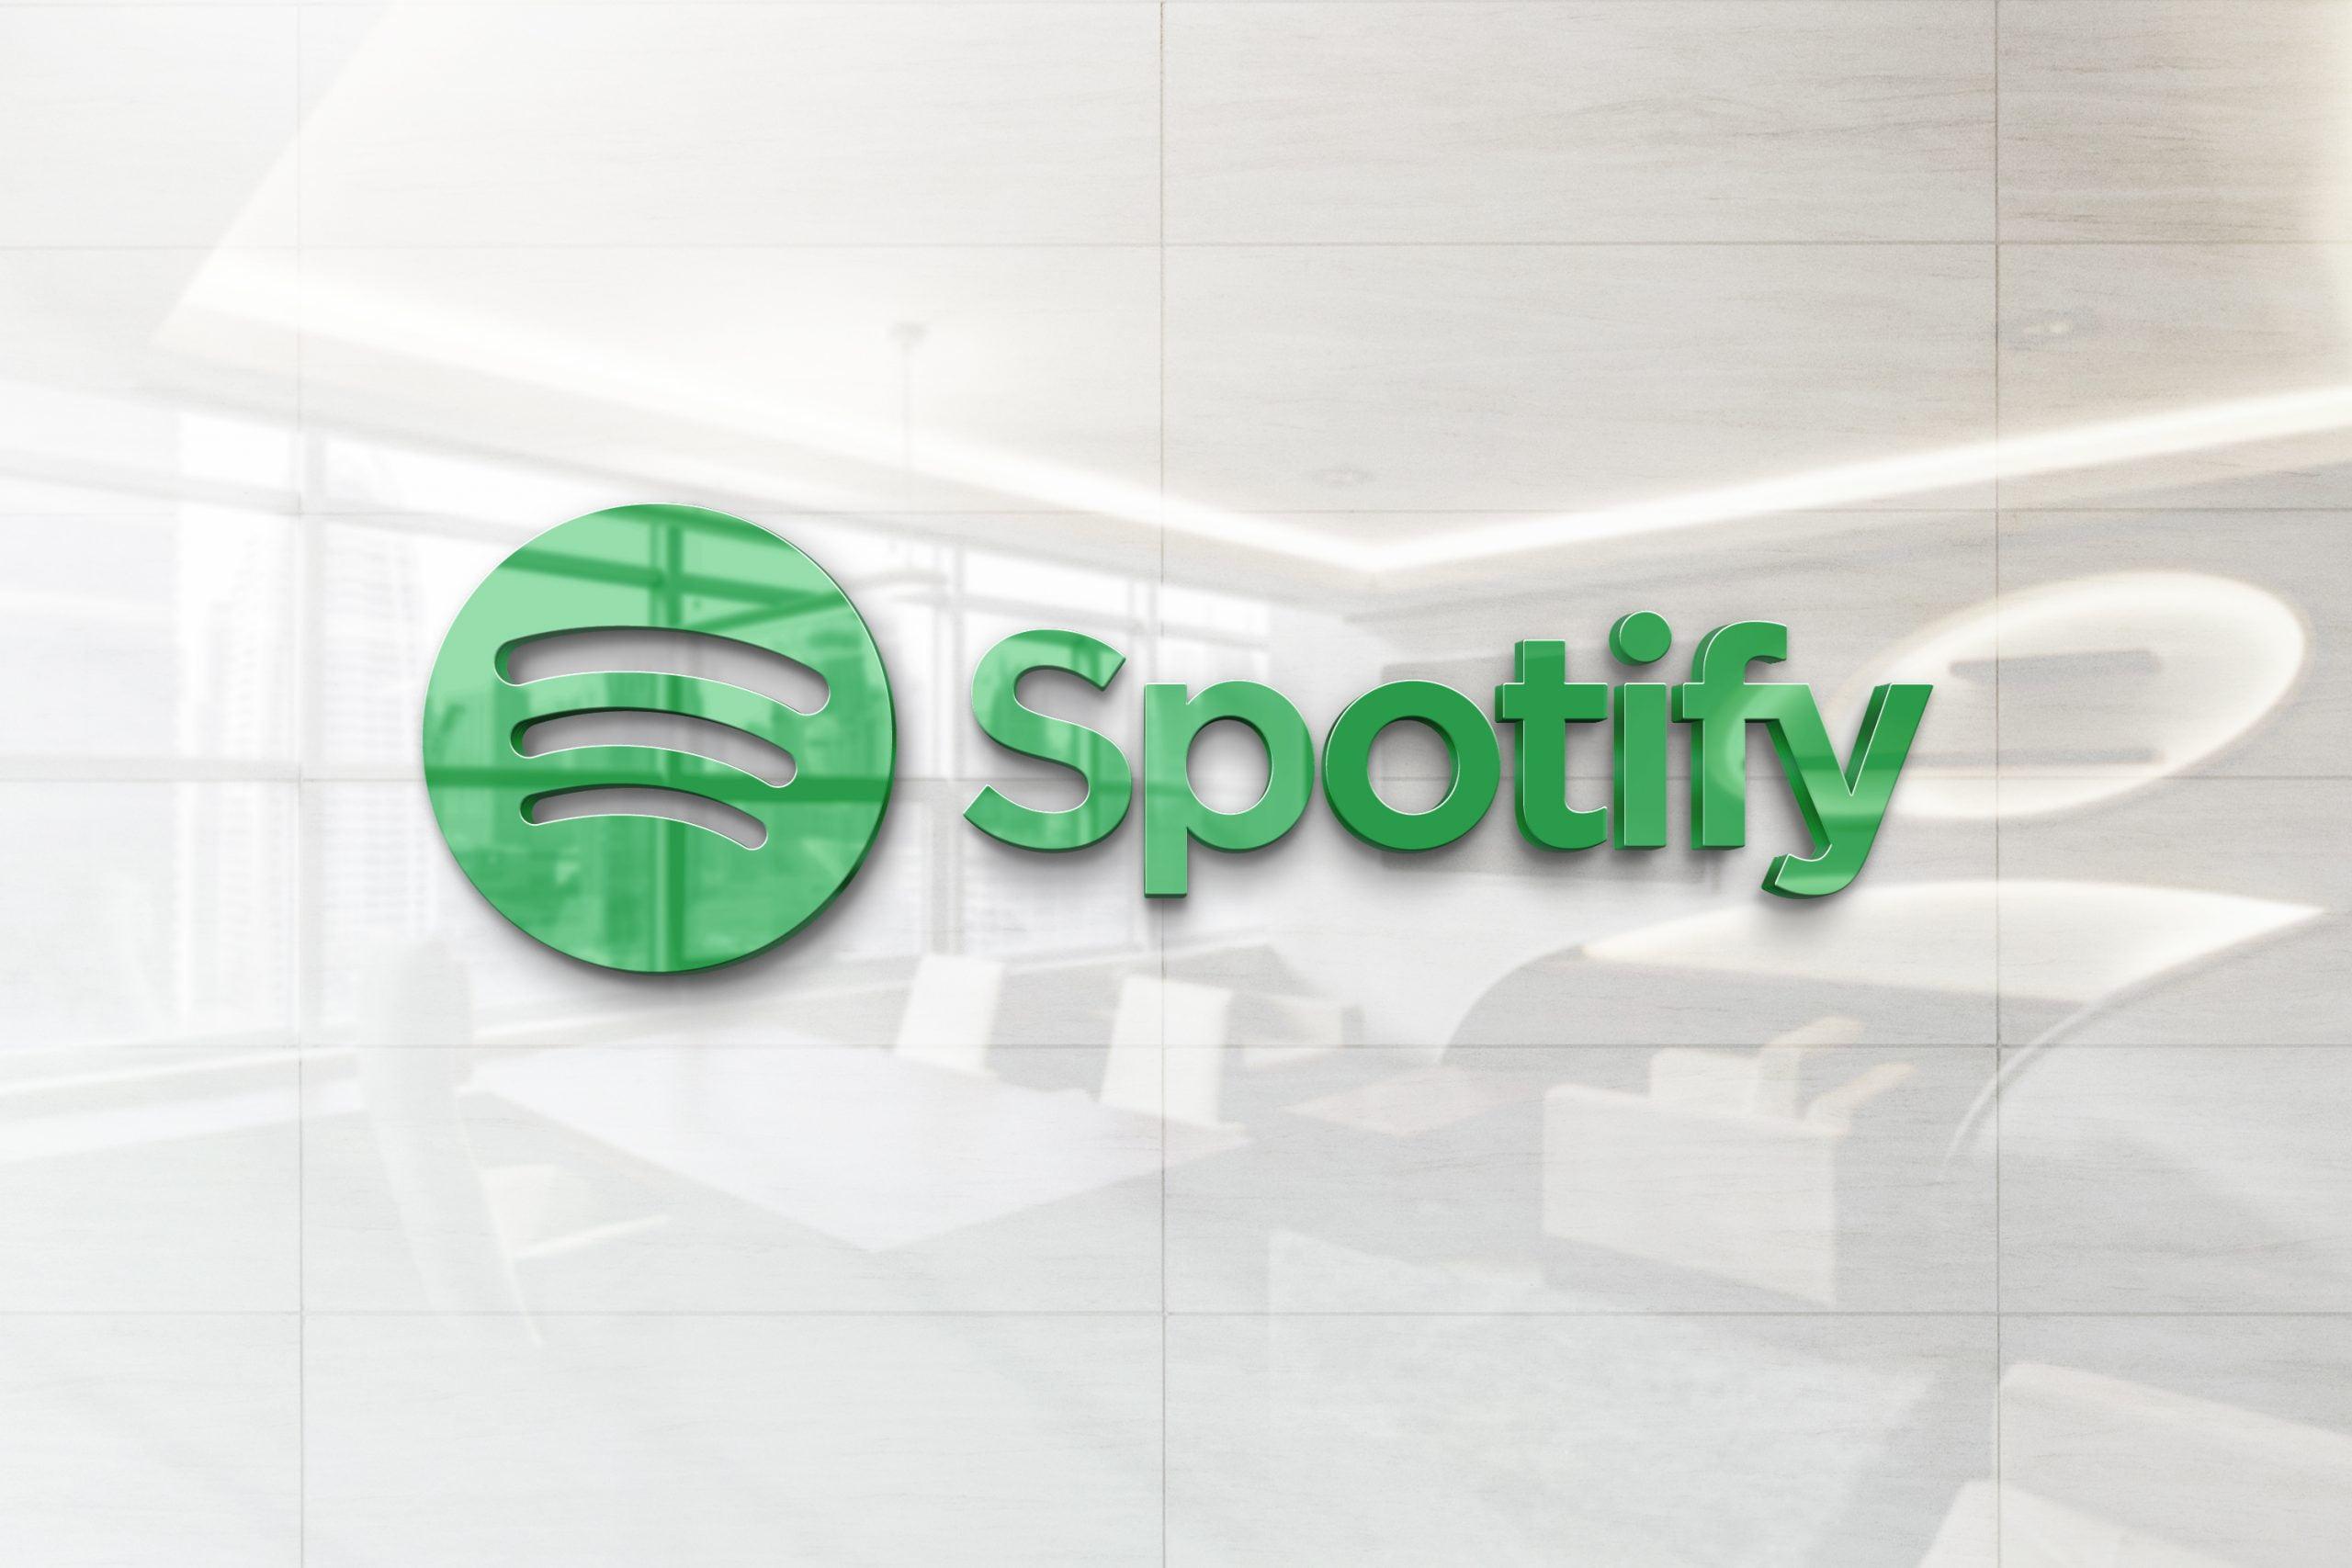 Glossy Wall Logo Mockup - Spotify